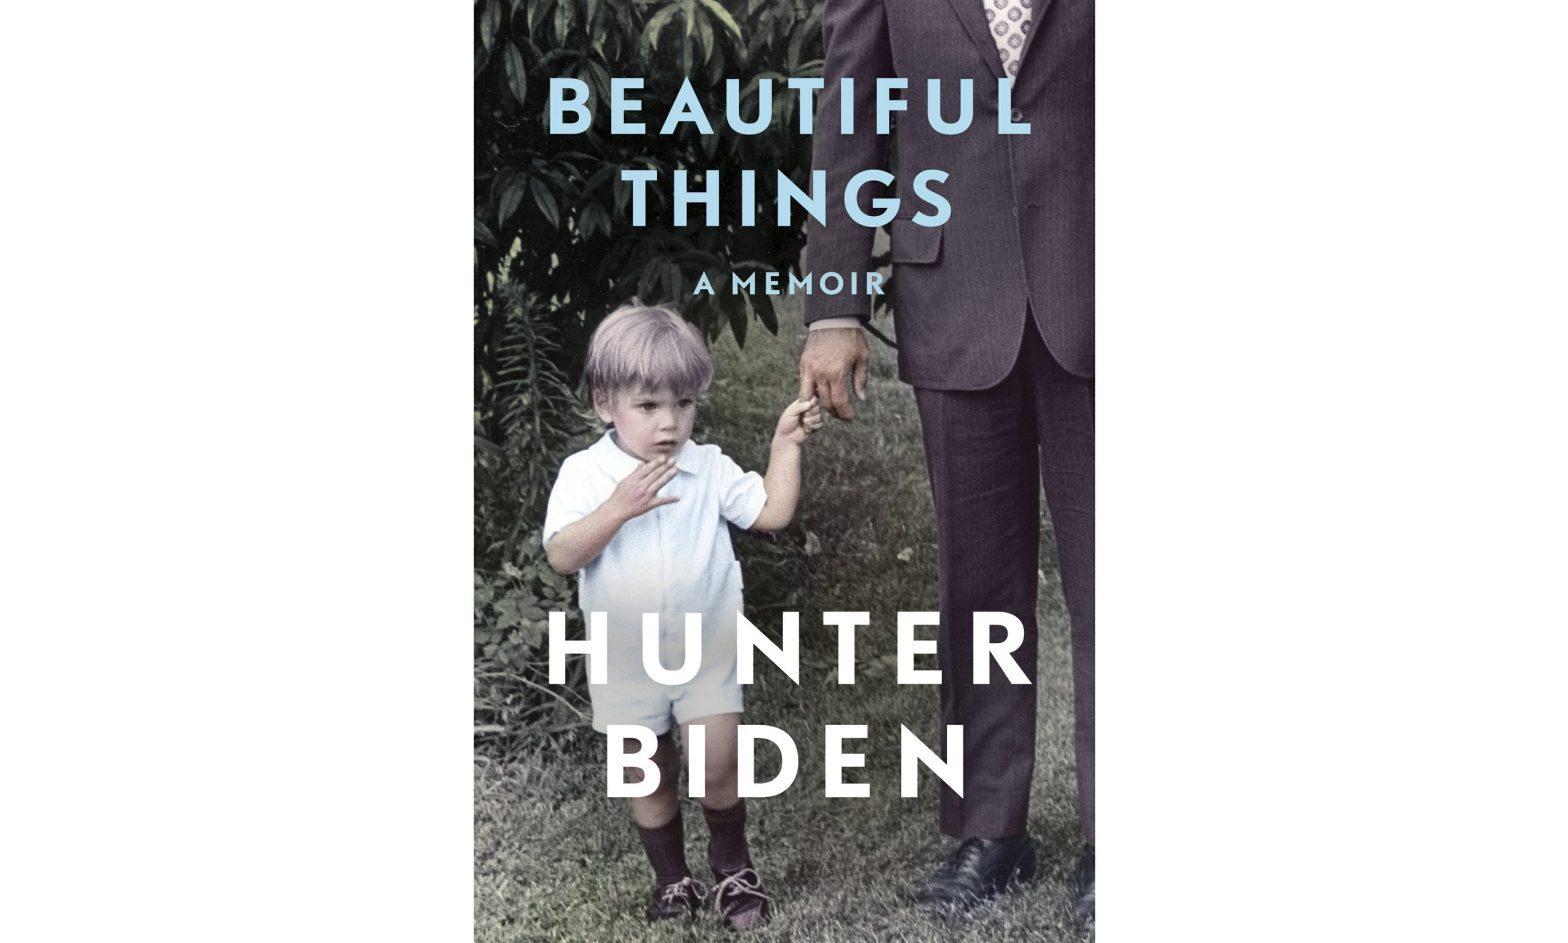 Hunter Biden to Release Memoir 'Beautiful Things'_40.1